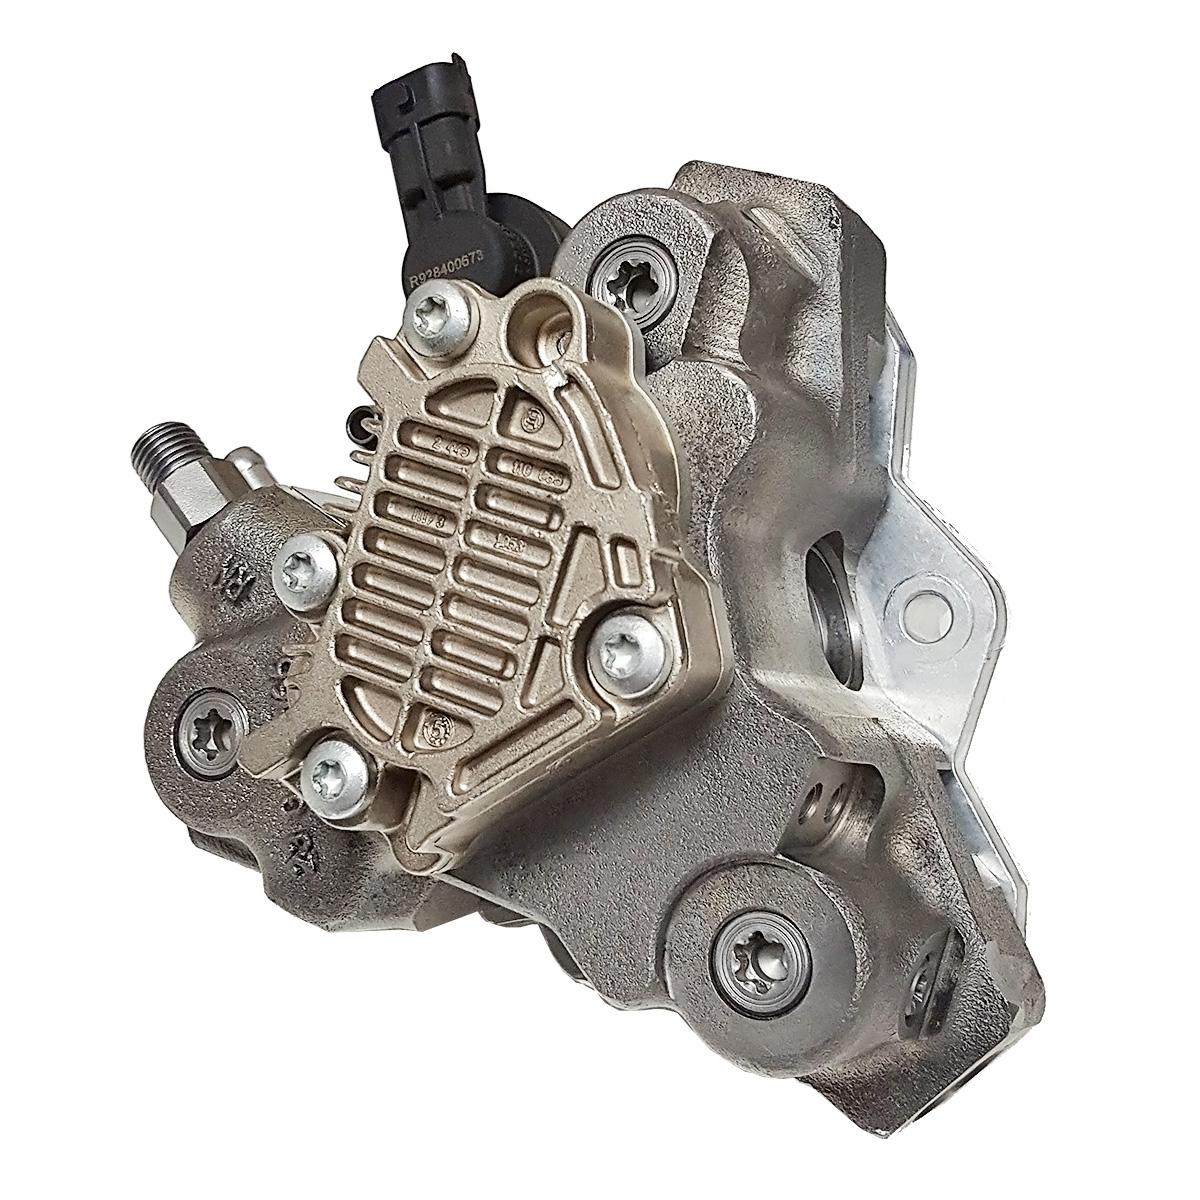 6.6L Duramax LBZ/LMM Fuel Injection Pump